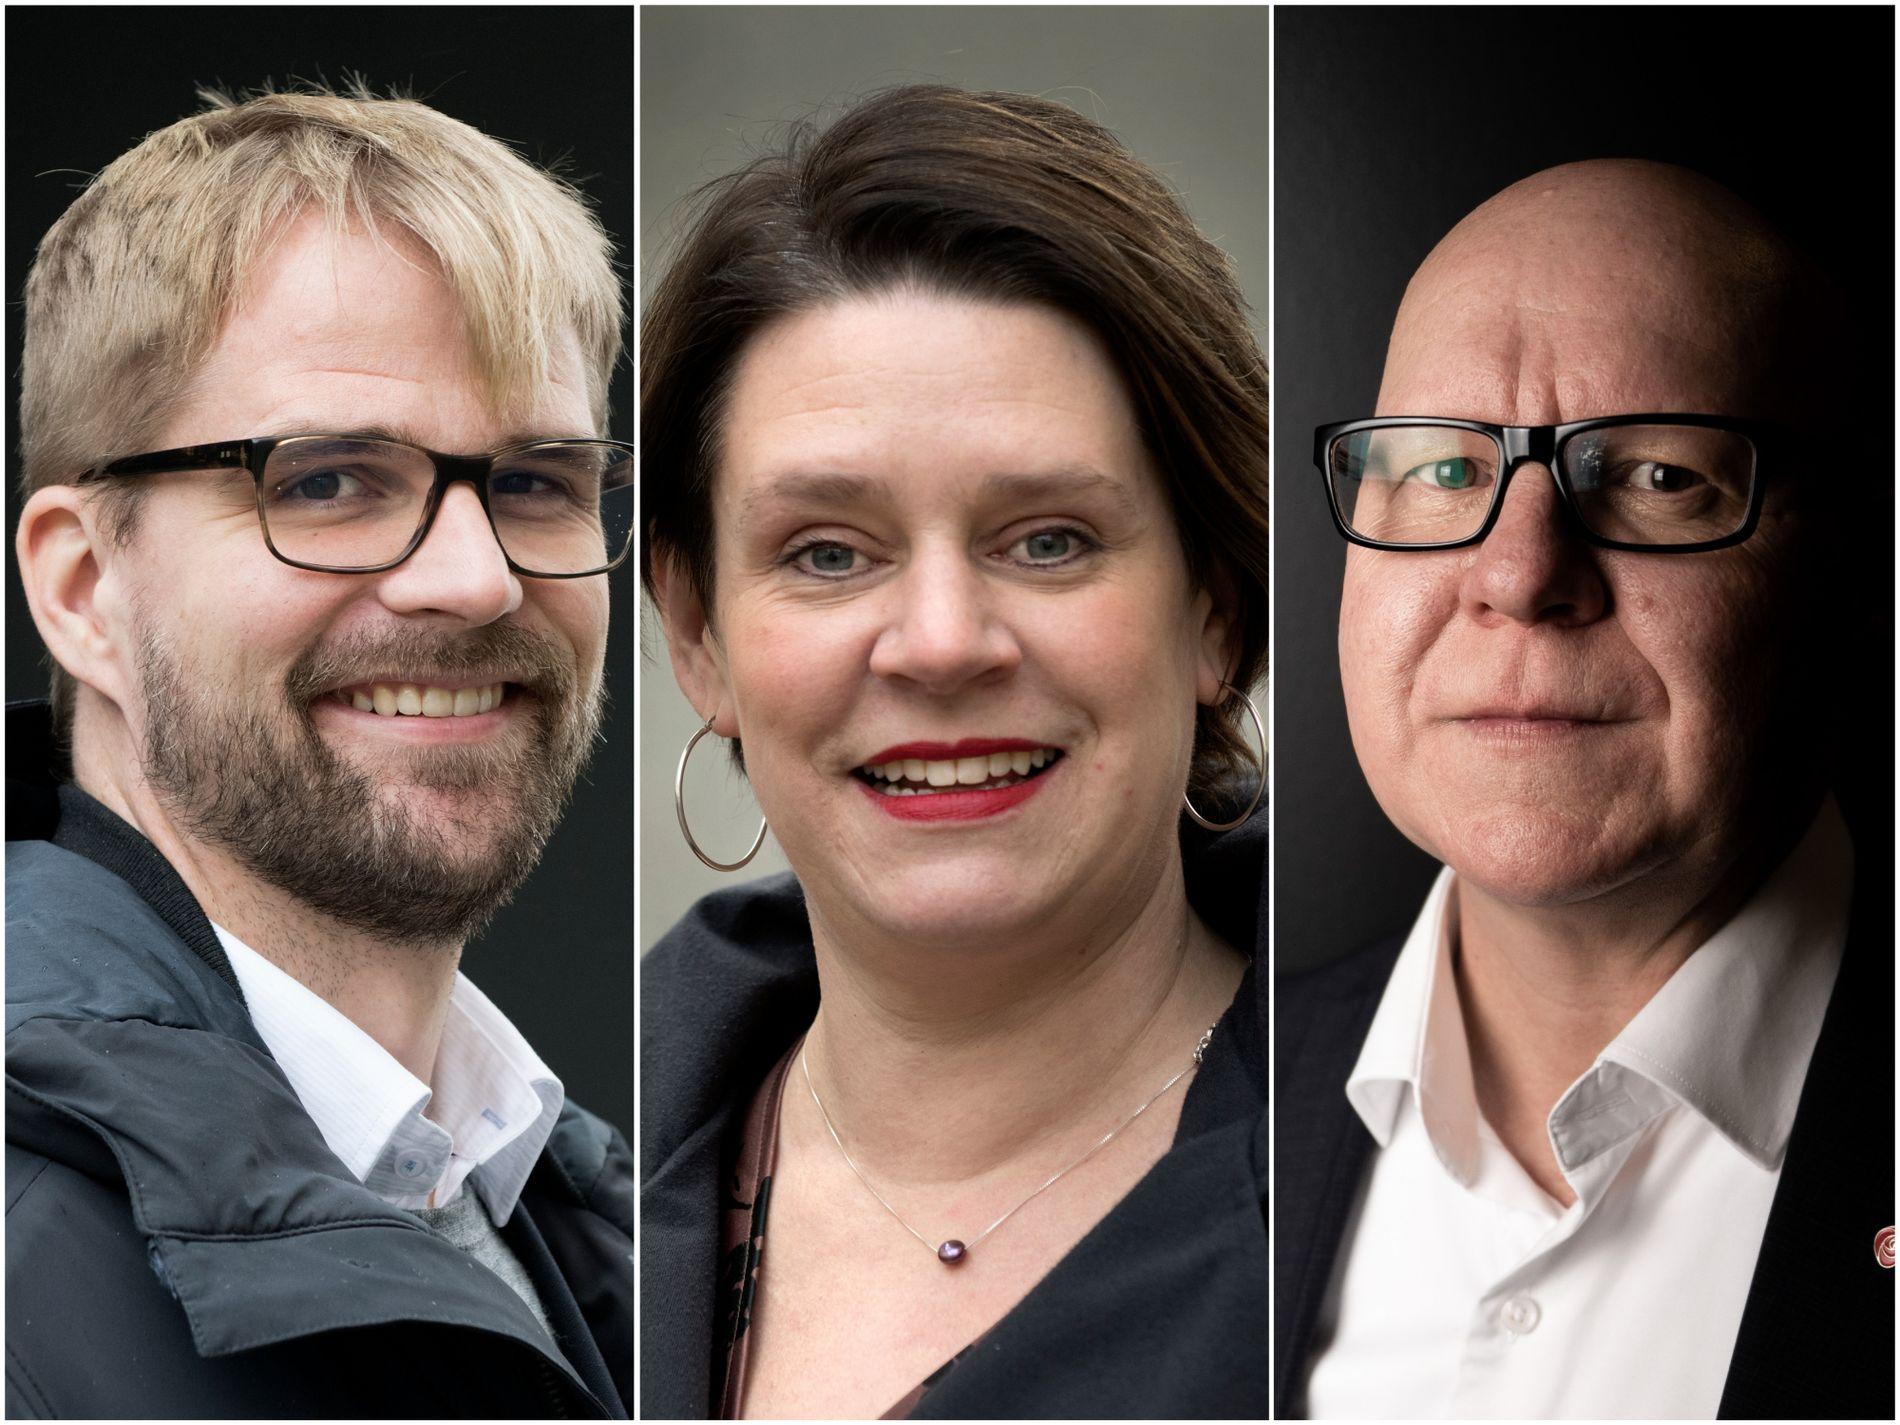 OMSTILLING: Er vi smarte og snarrådige nå, kan vi leve både gode og klimavennlige liv i fremtiden, og attpåtil tjene penger på den grønne omstillingen, skriver Roger Valhammer, Marte Mjøs Pedersen og Rune Bakervik i Arbeiderpartiet.